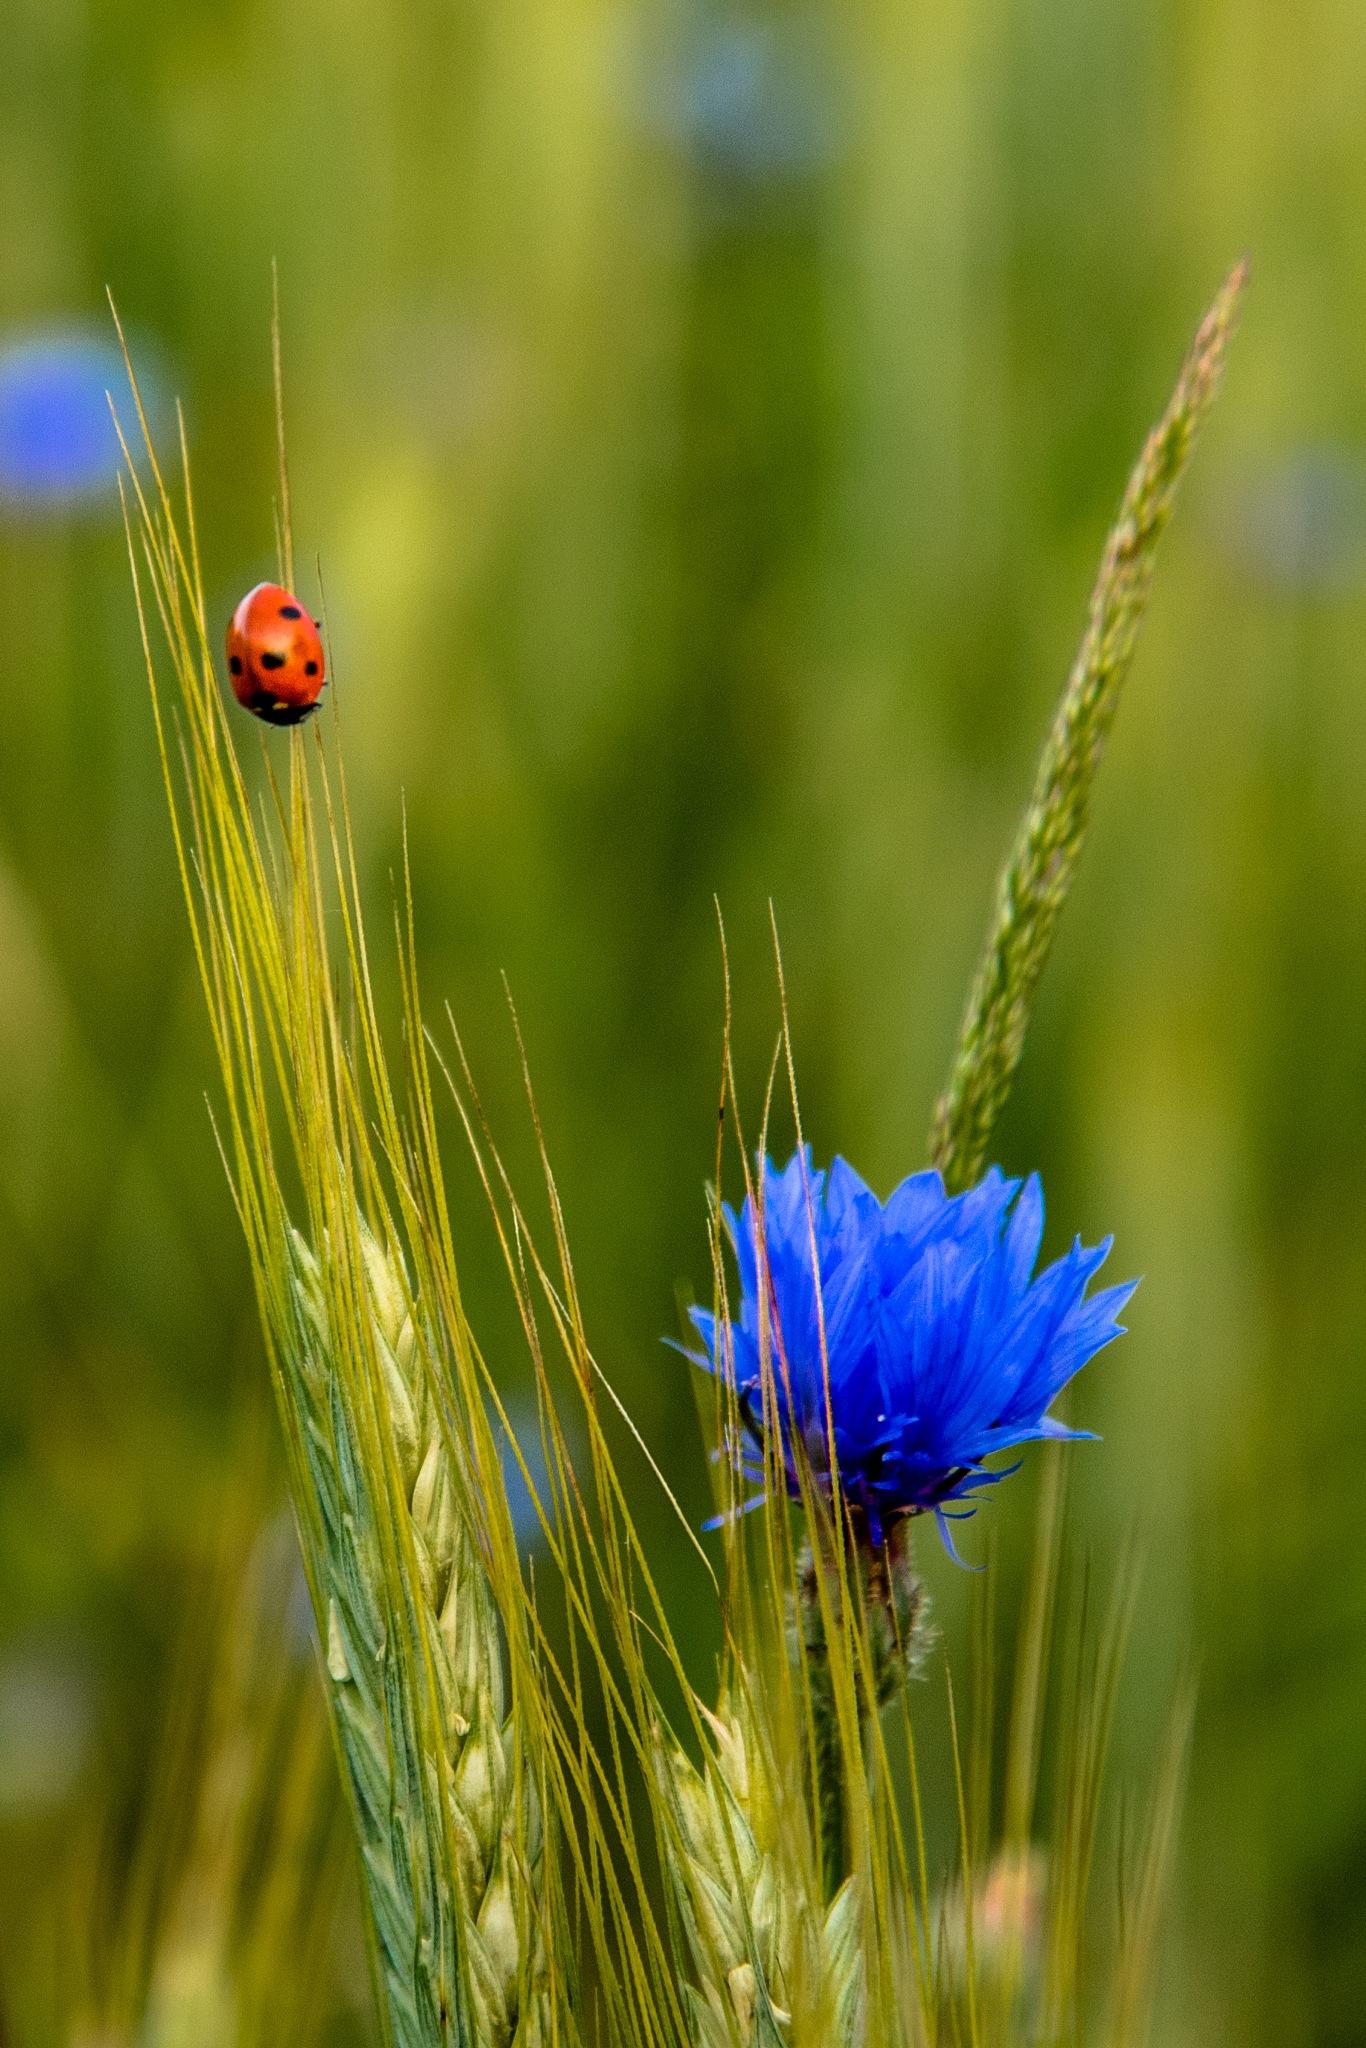 Ladybug and cornflower by Mattias Geisler